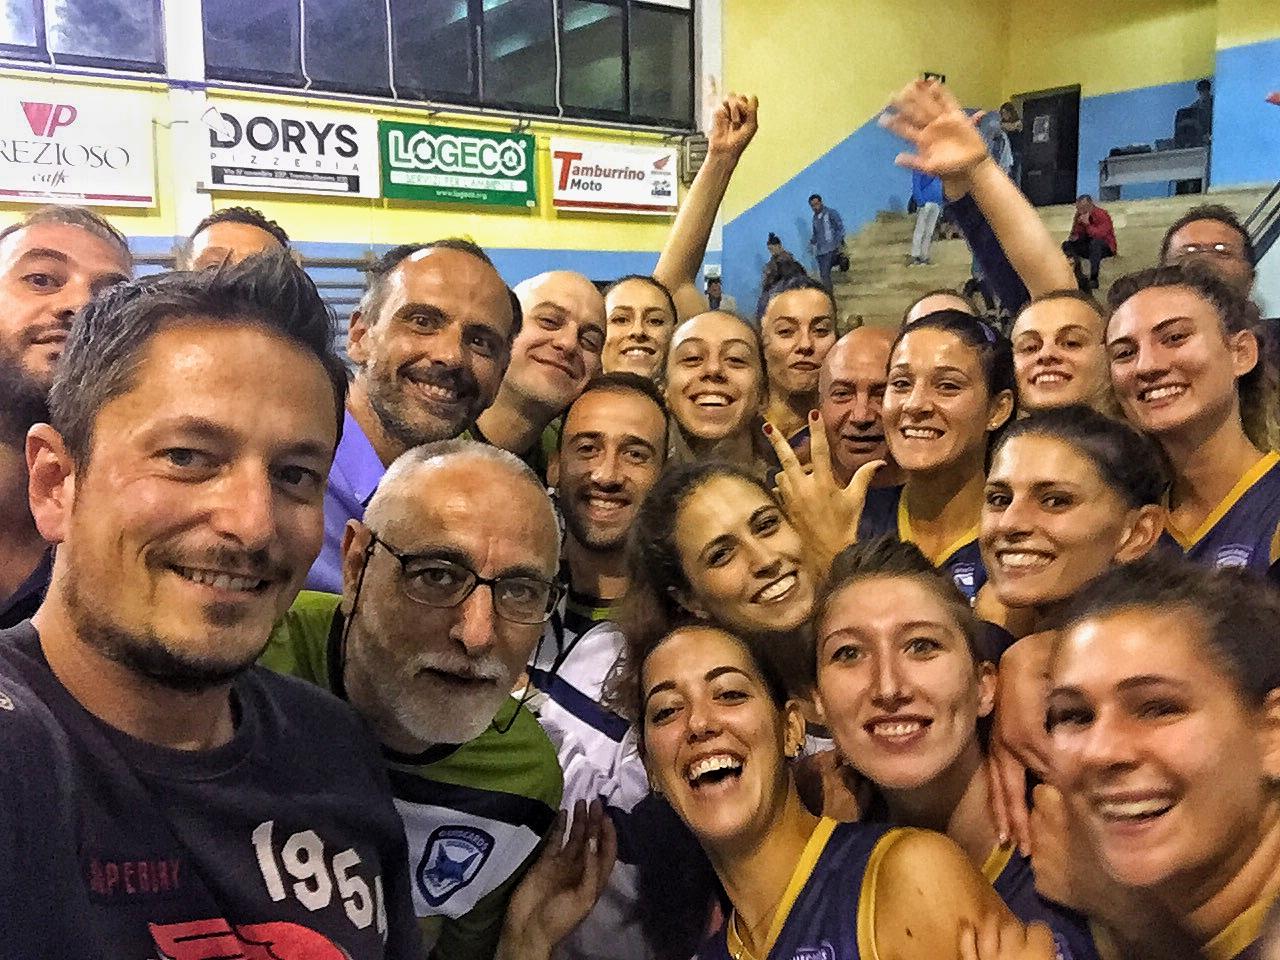 http://www.salernonotizie.net/wp-content/uploads/2018/10/Alp-Aversa-vs-Salerno-Guiscards-Coppa-Campania-6.jpg